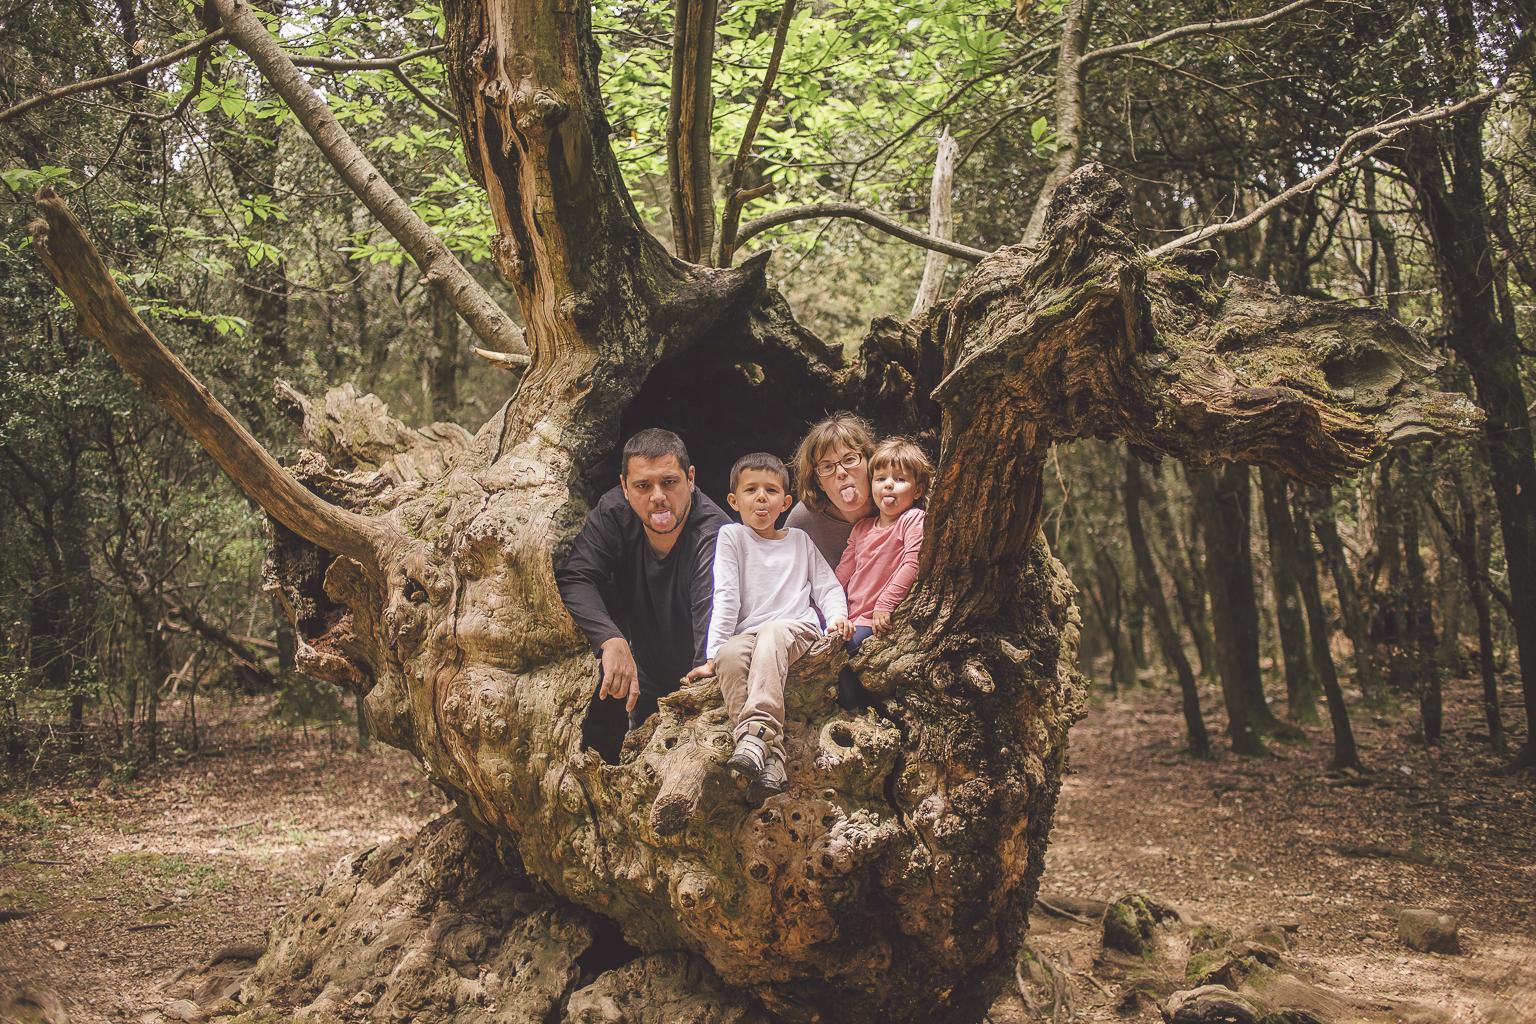 Fotógrafo de familia :: Hotel Sant Bernat - Montseny :: Fotografía familiar :: Bosque :: Montaña del Montseny :: Reportaje de familia en el bosque :: Familia en el bosque :: Familia en la montaña :: Fotografía natural de familia